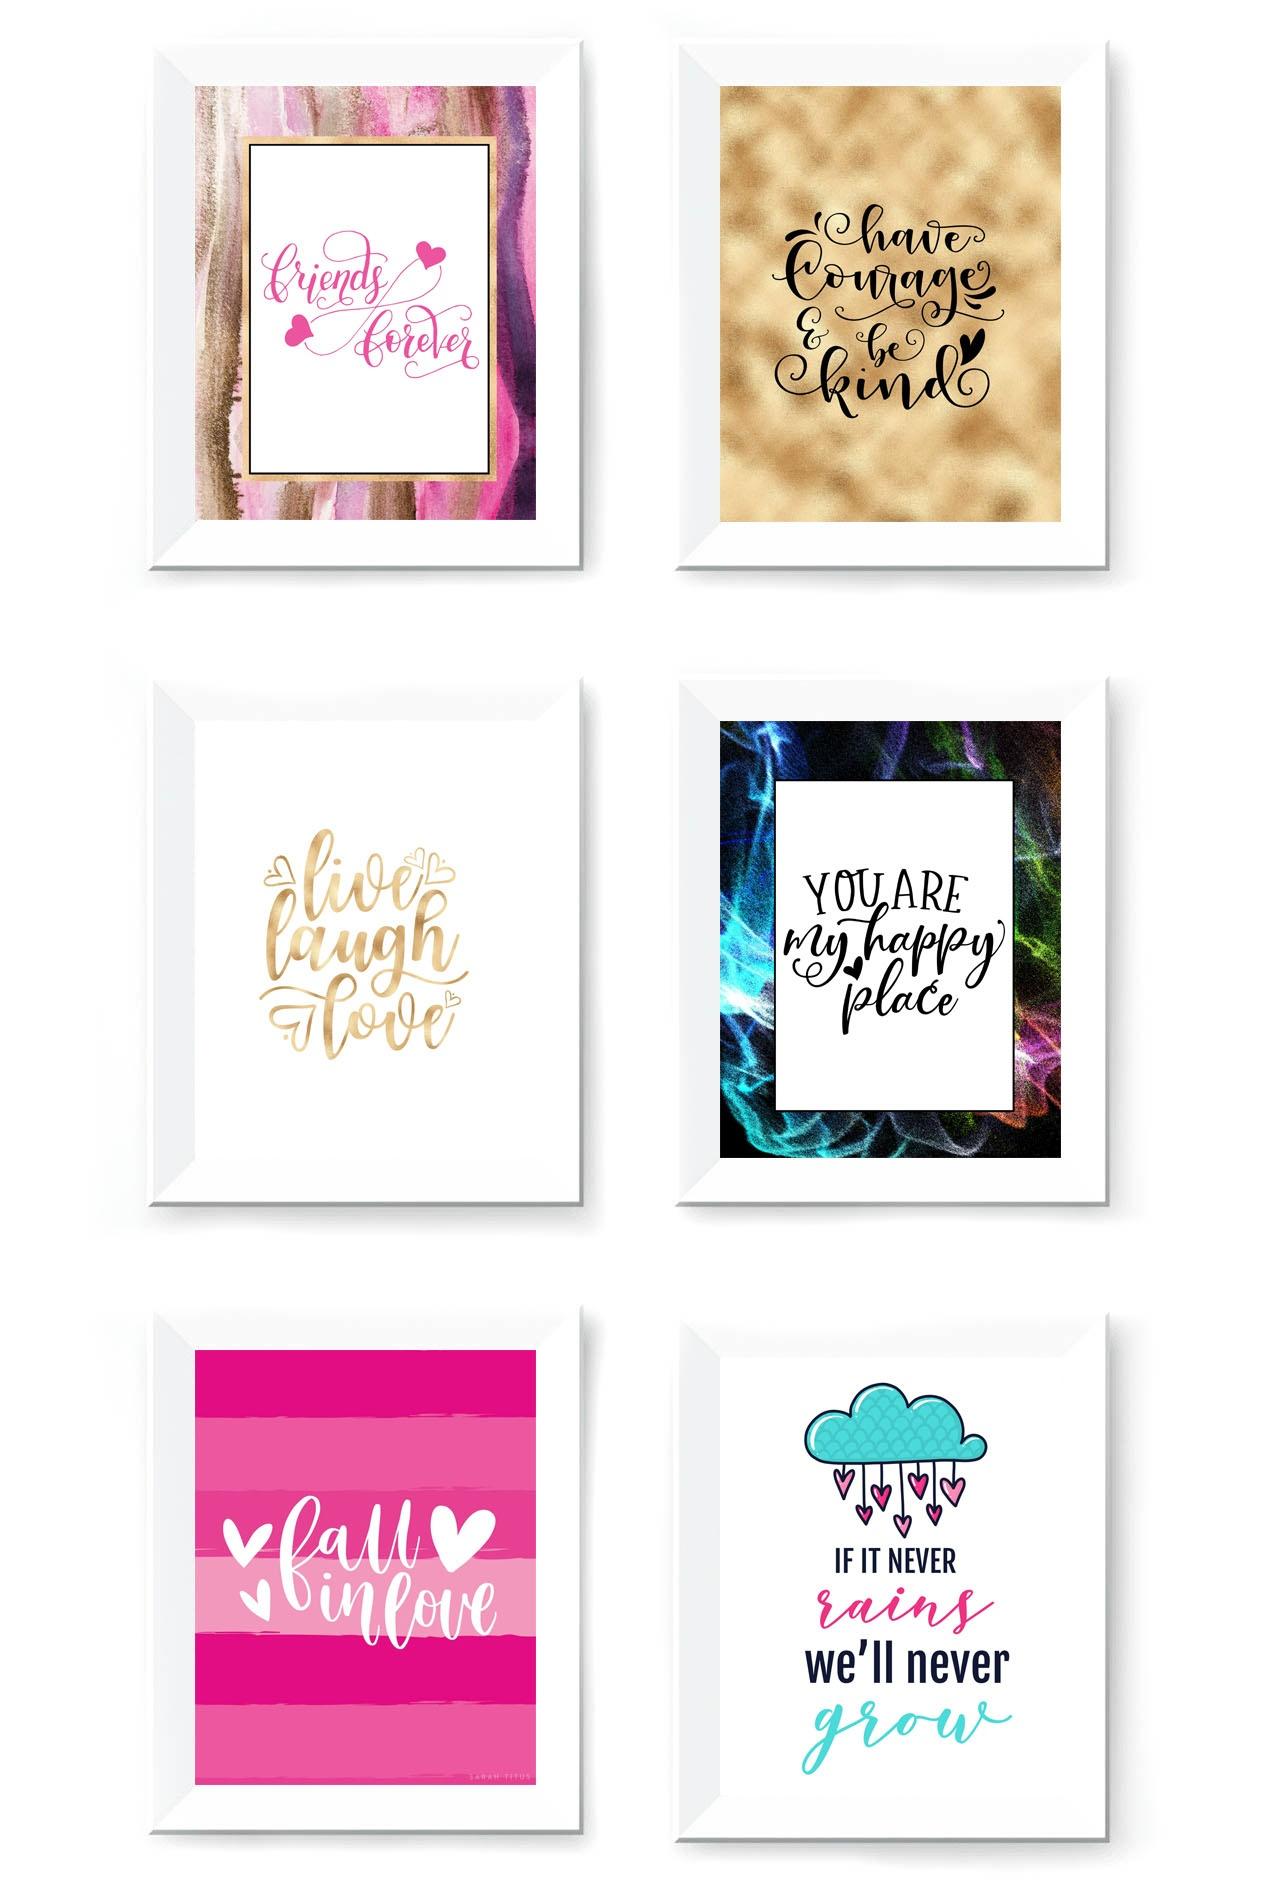 Free Printable Wall Art To Download Now - Sarah Titus - Free Printable Art